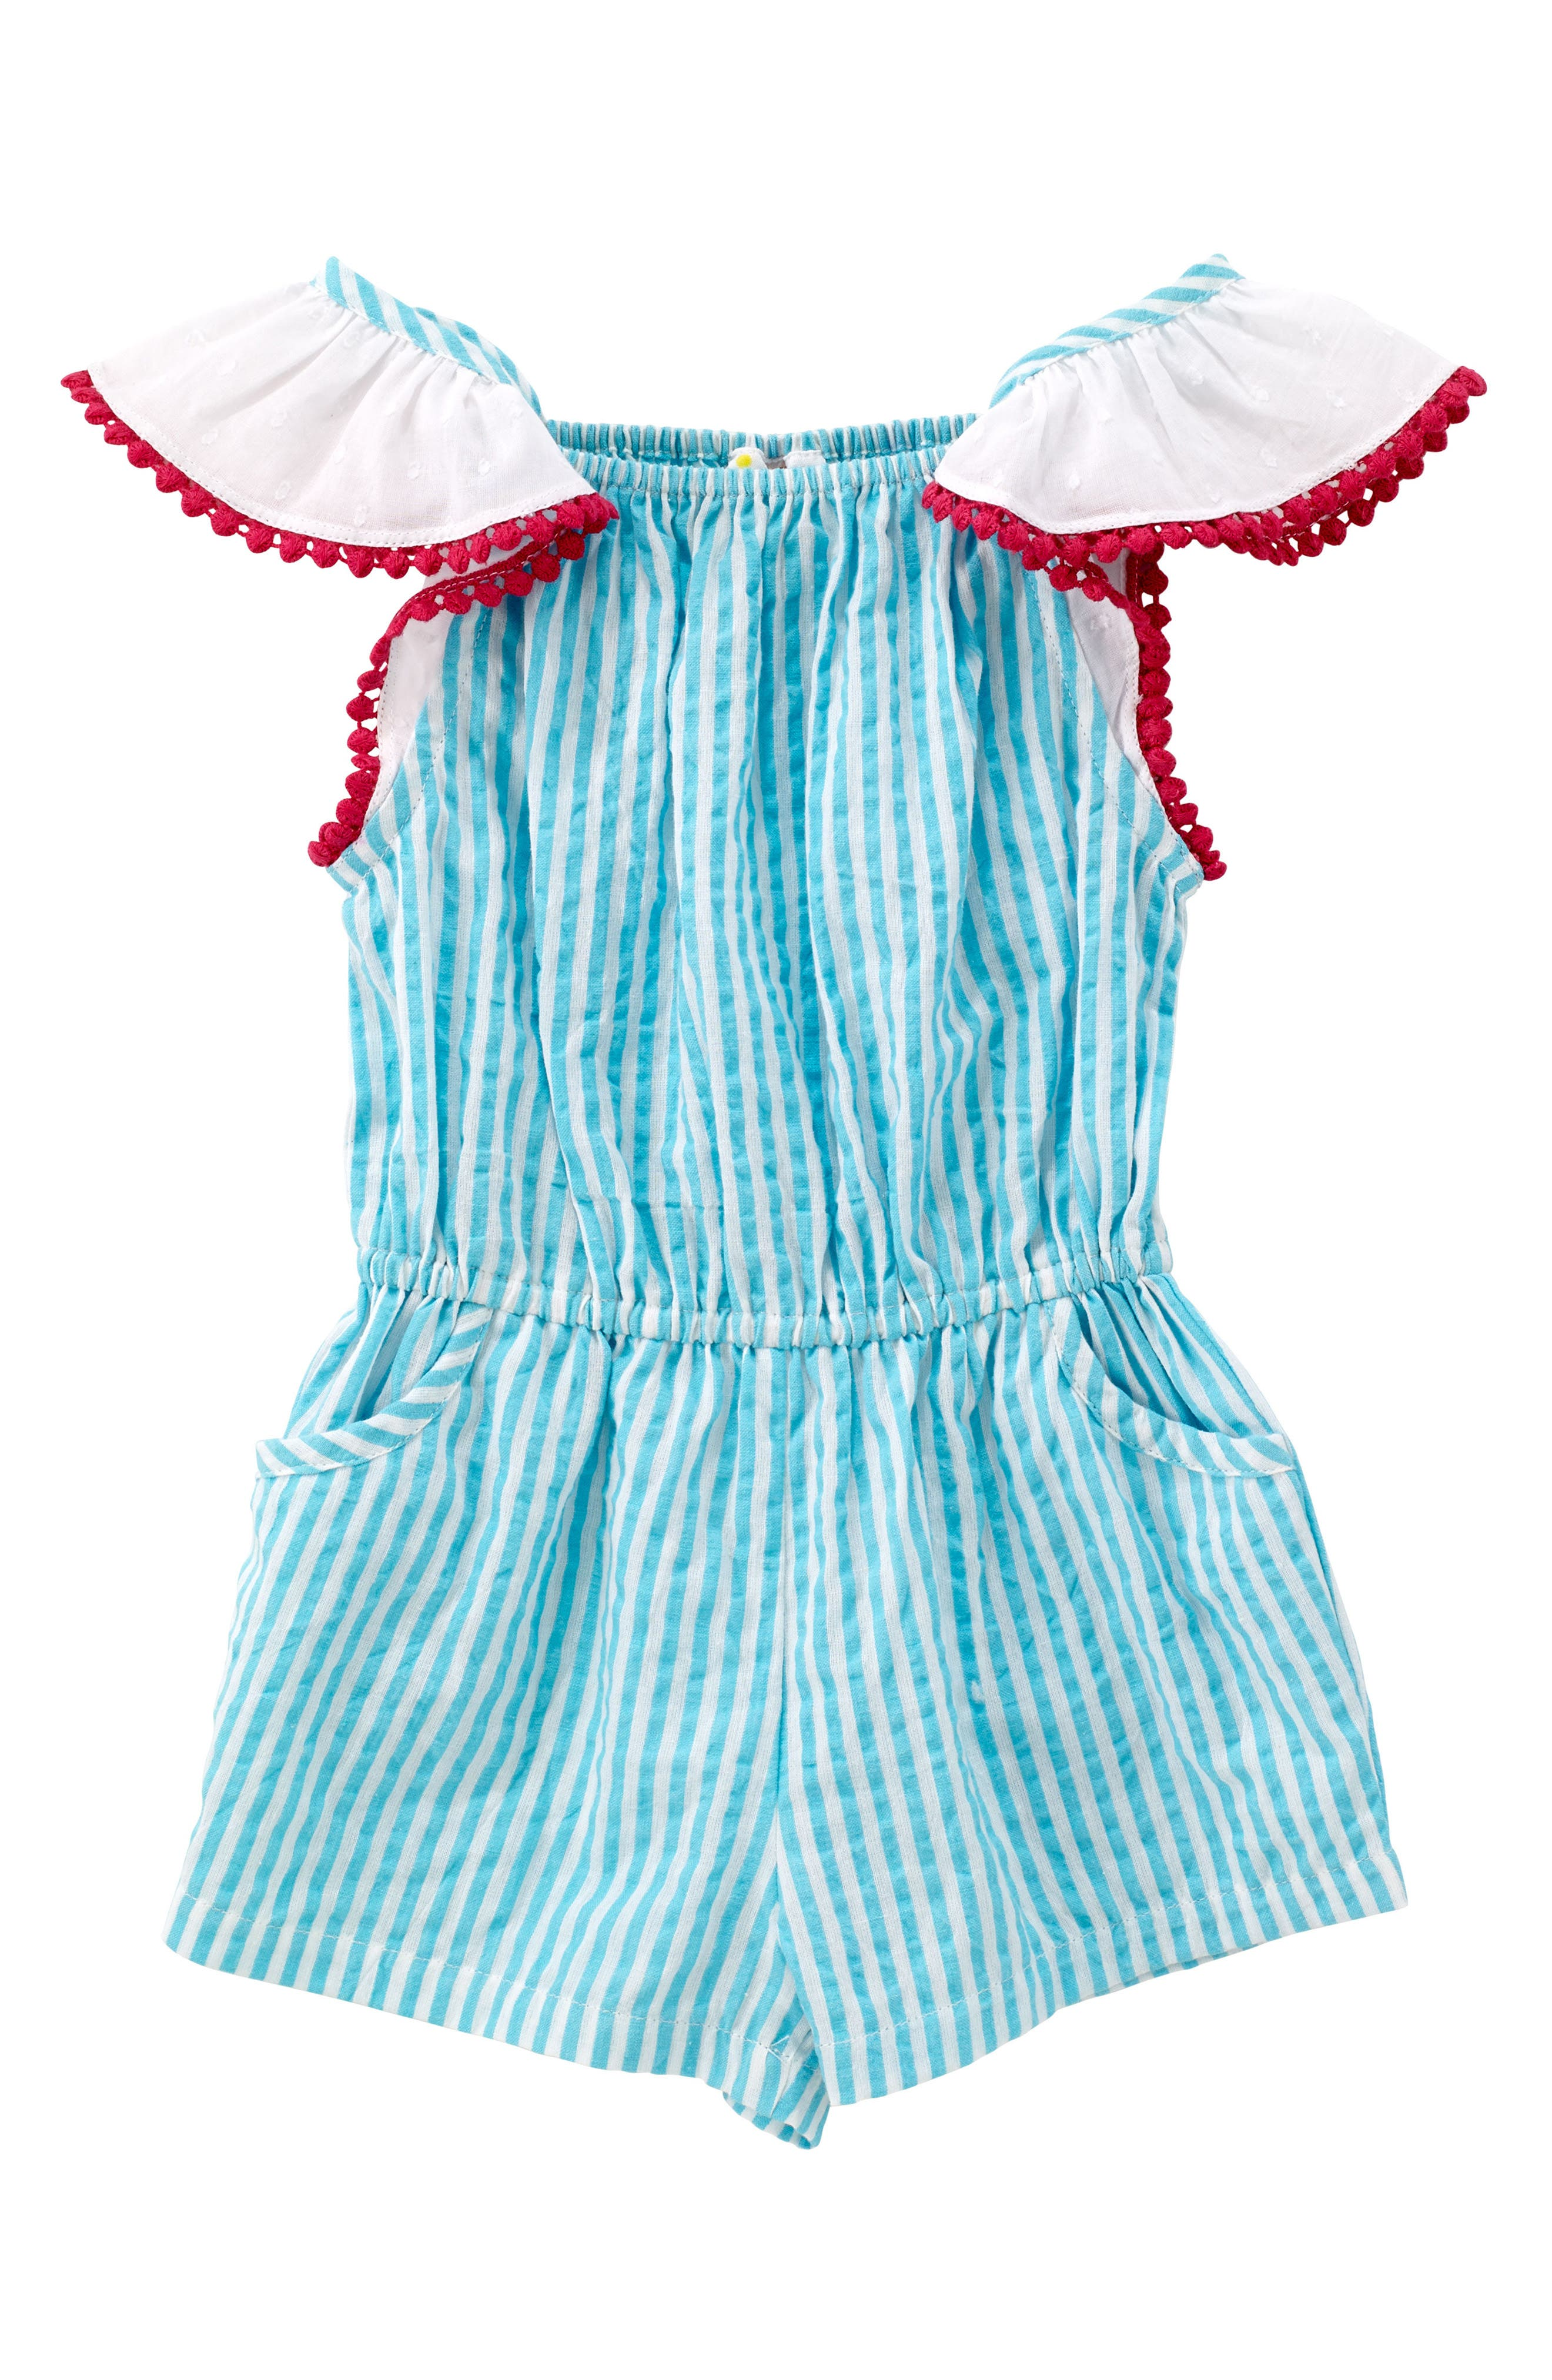 Alternate Image 1 Selected - Masalababy Zuri Stripe Romper (Toddler Girls)